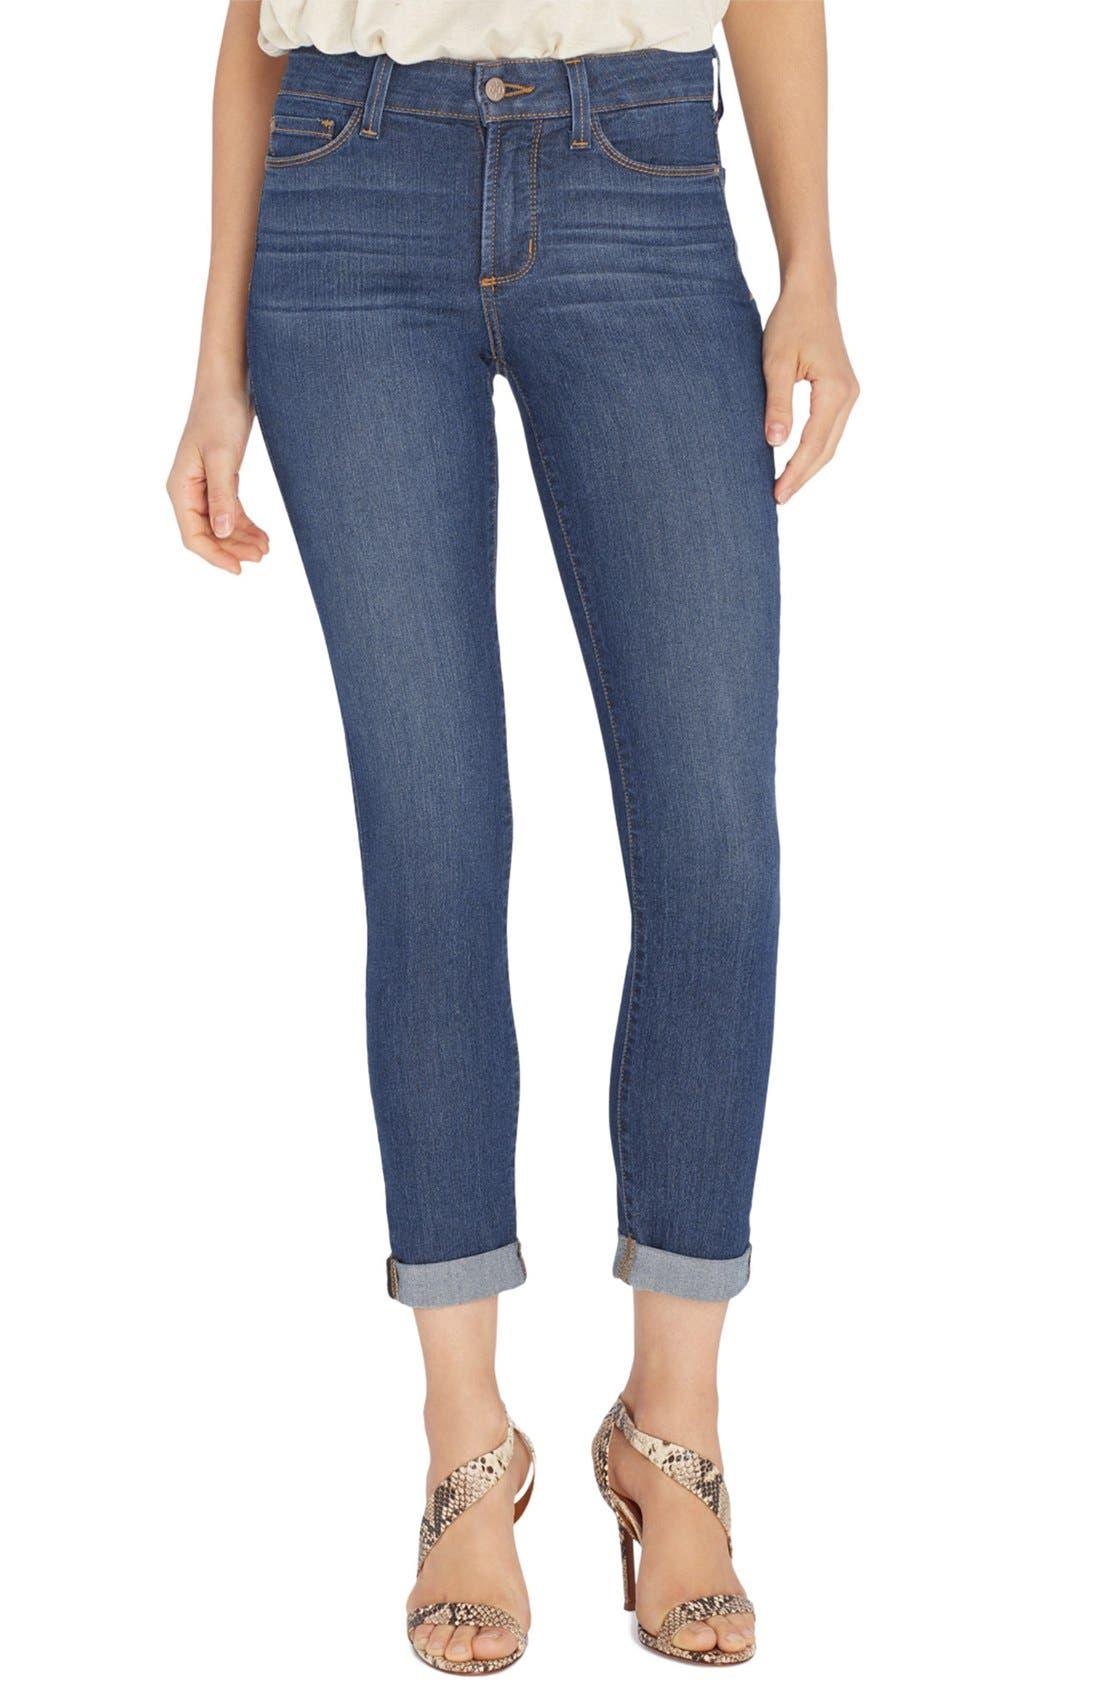 'Annabelle' Stretch Boyfriend Jeans,                         Main,                         color, Atlanta